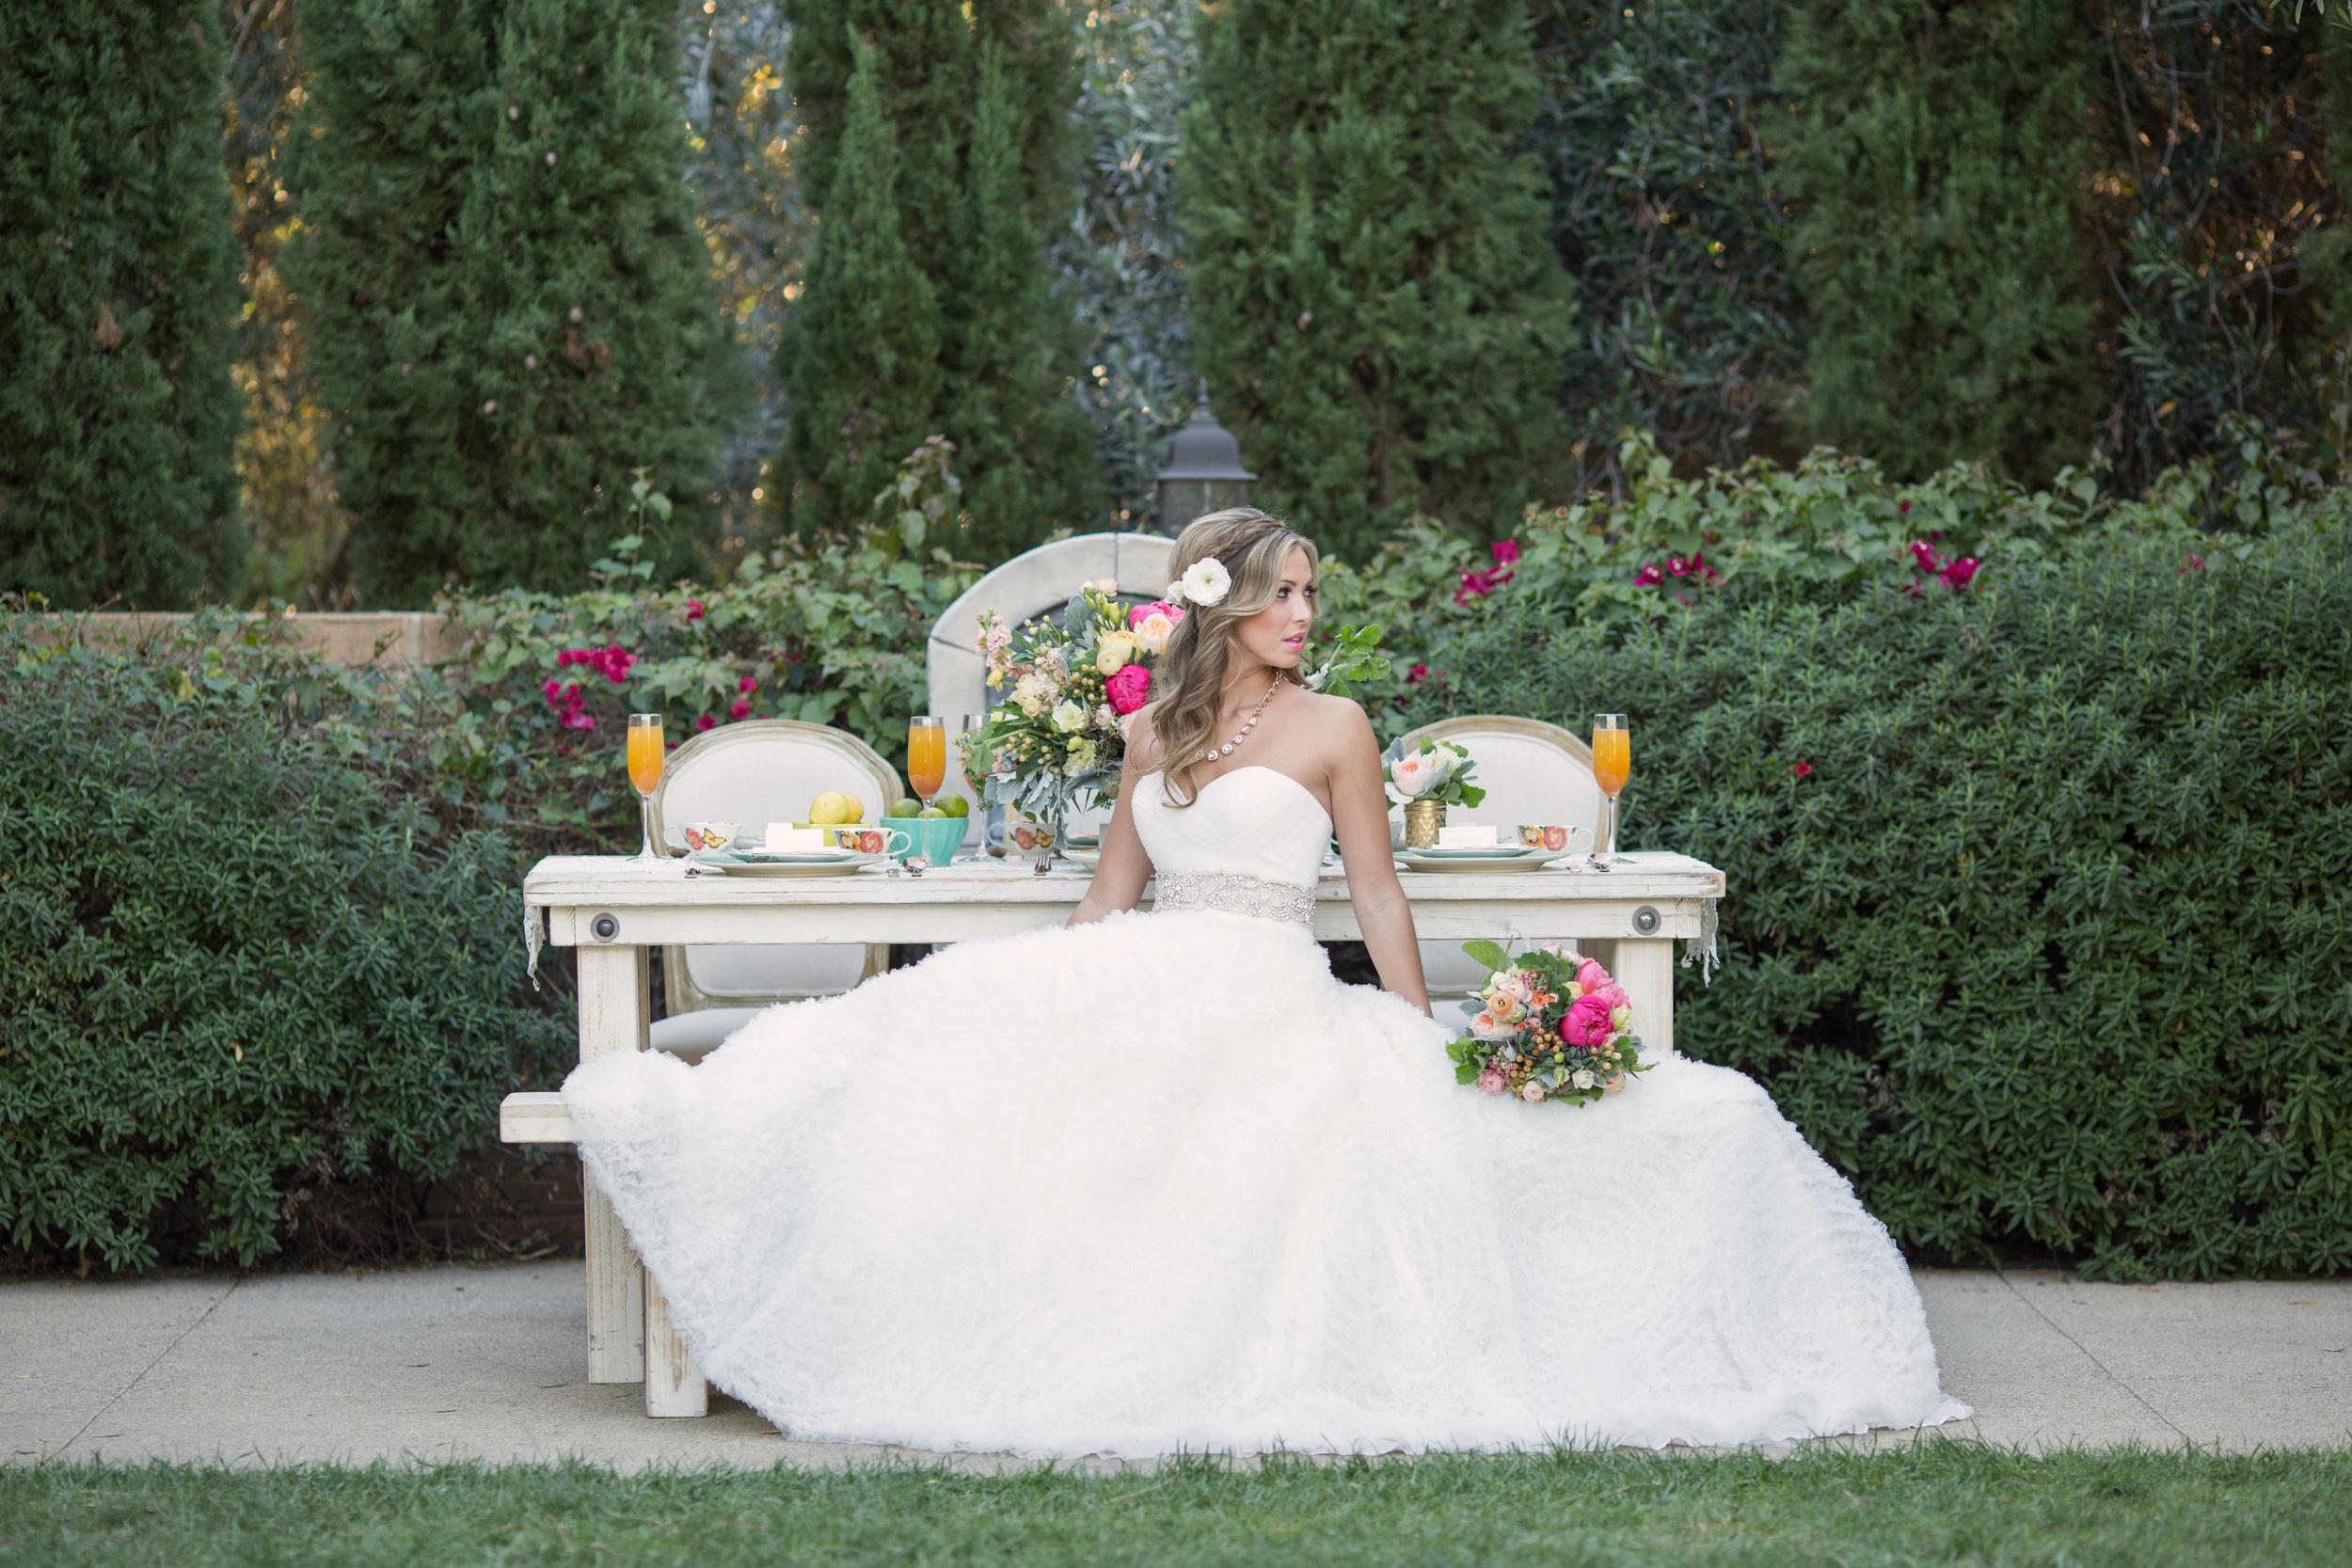 David Manning Photography and Morgan Leigh Boberg proposal farm table rentals The Estancia